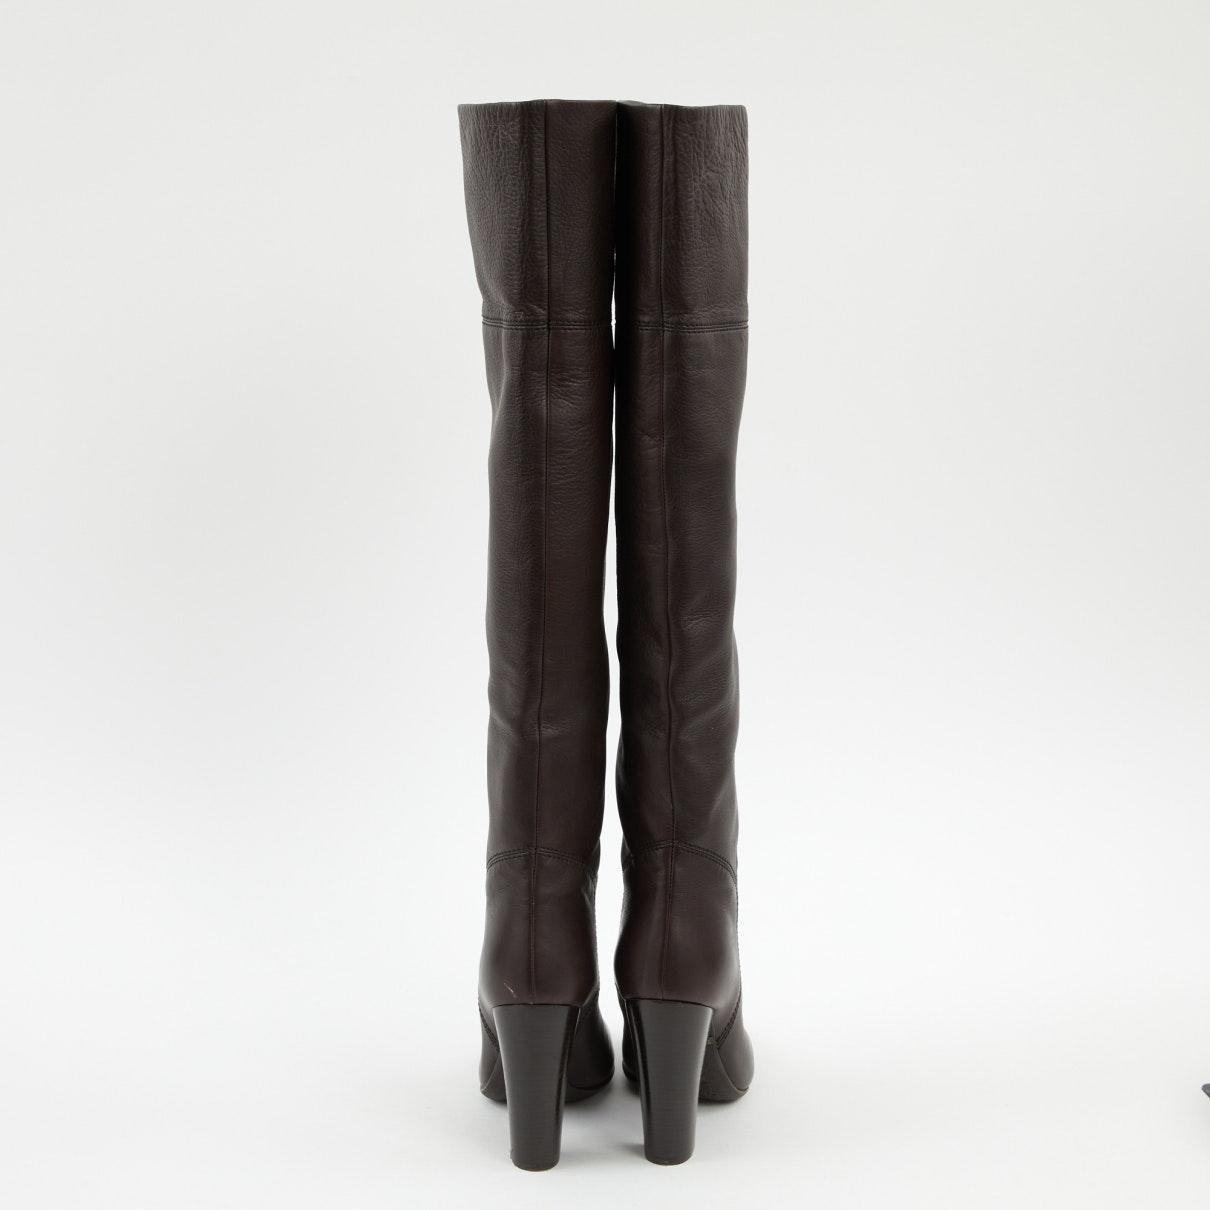 Botas en cuero negro Giuseppe Zanotti de Cuero de color Negro